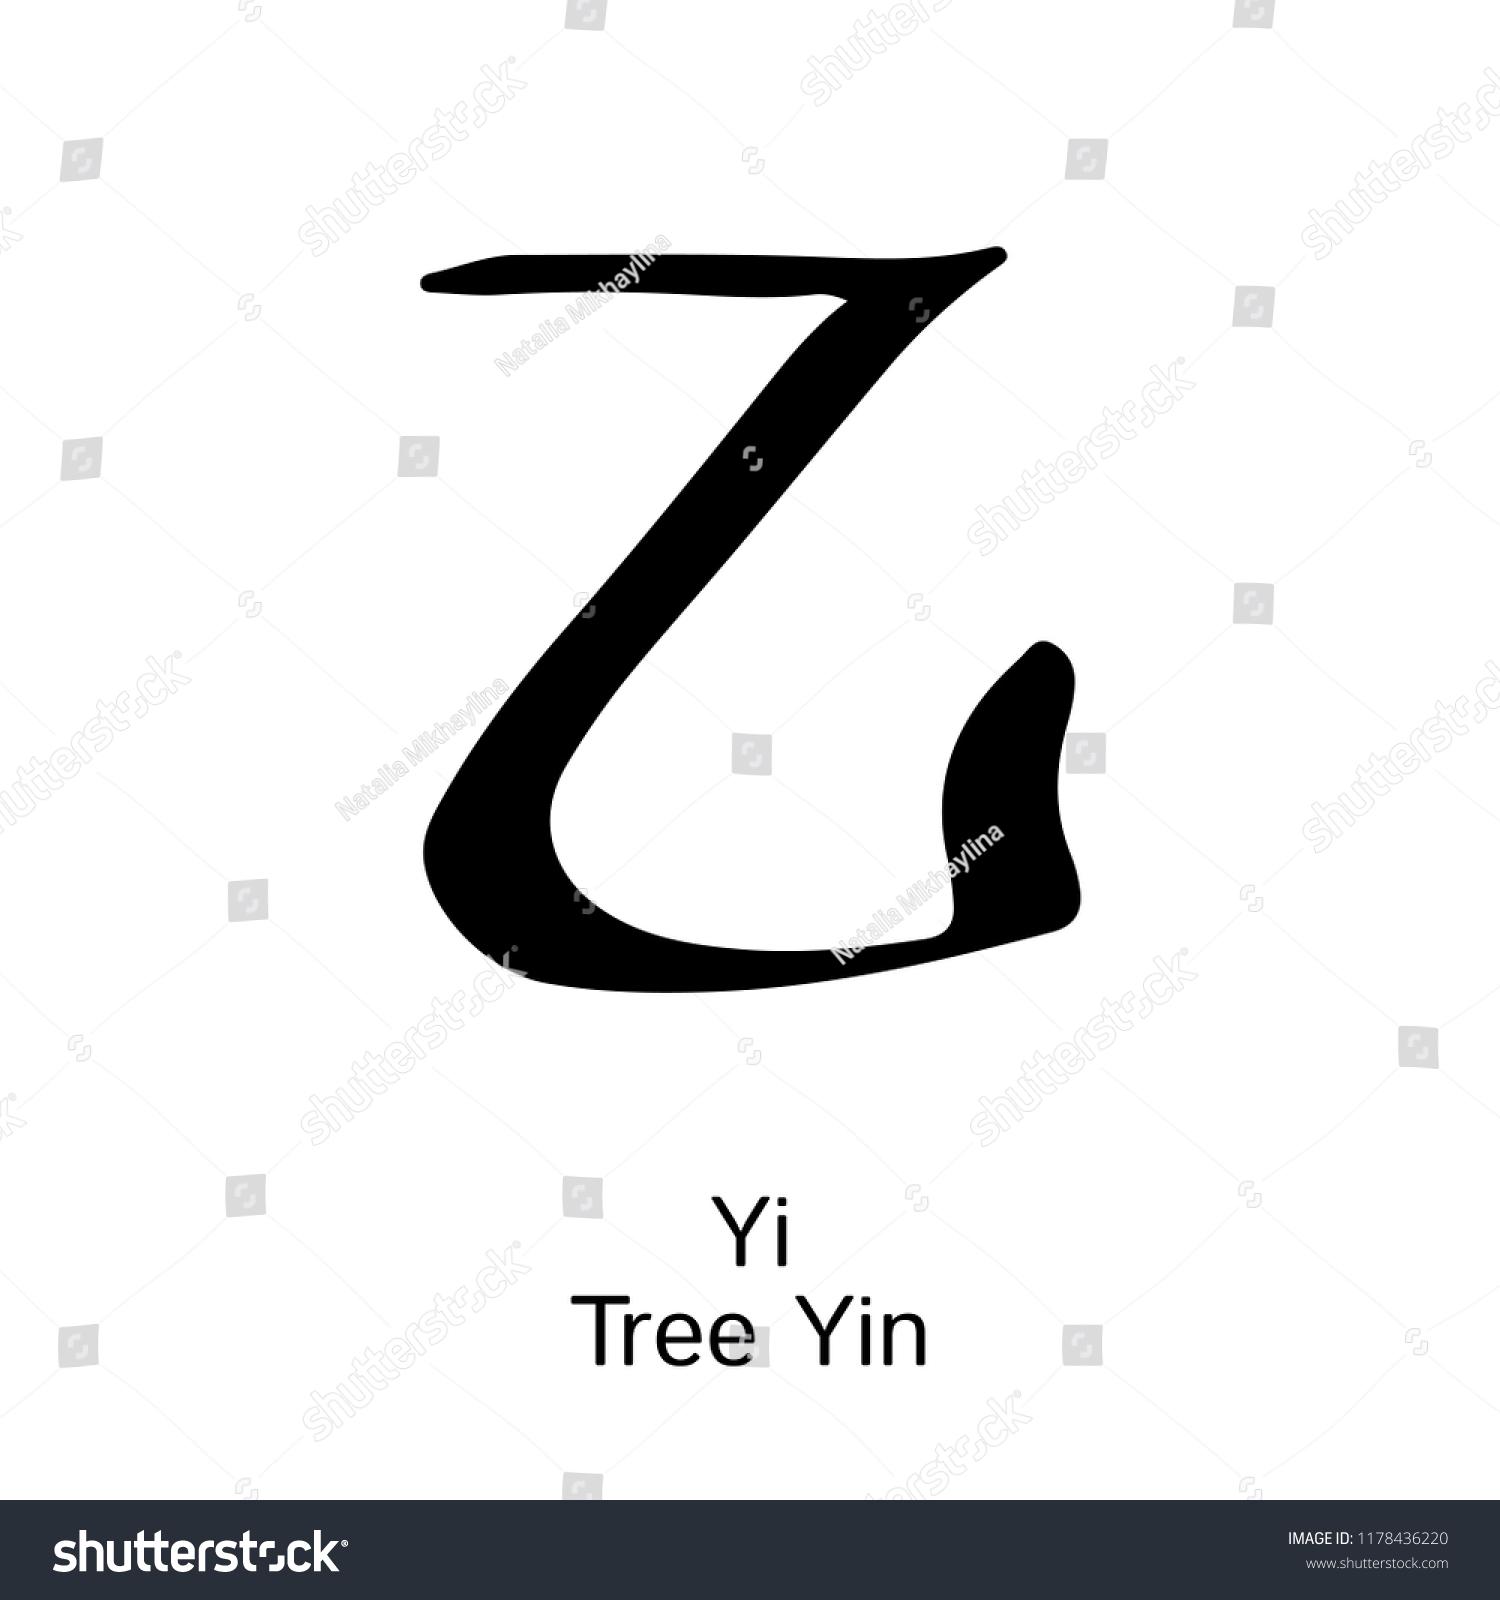 Hieroglyph Tree Yi Yin Vector Ink Stock Vector Royalty Free